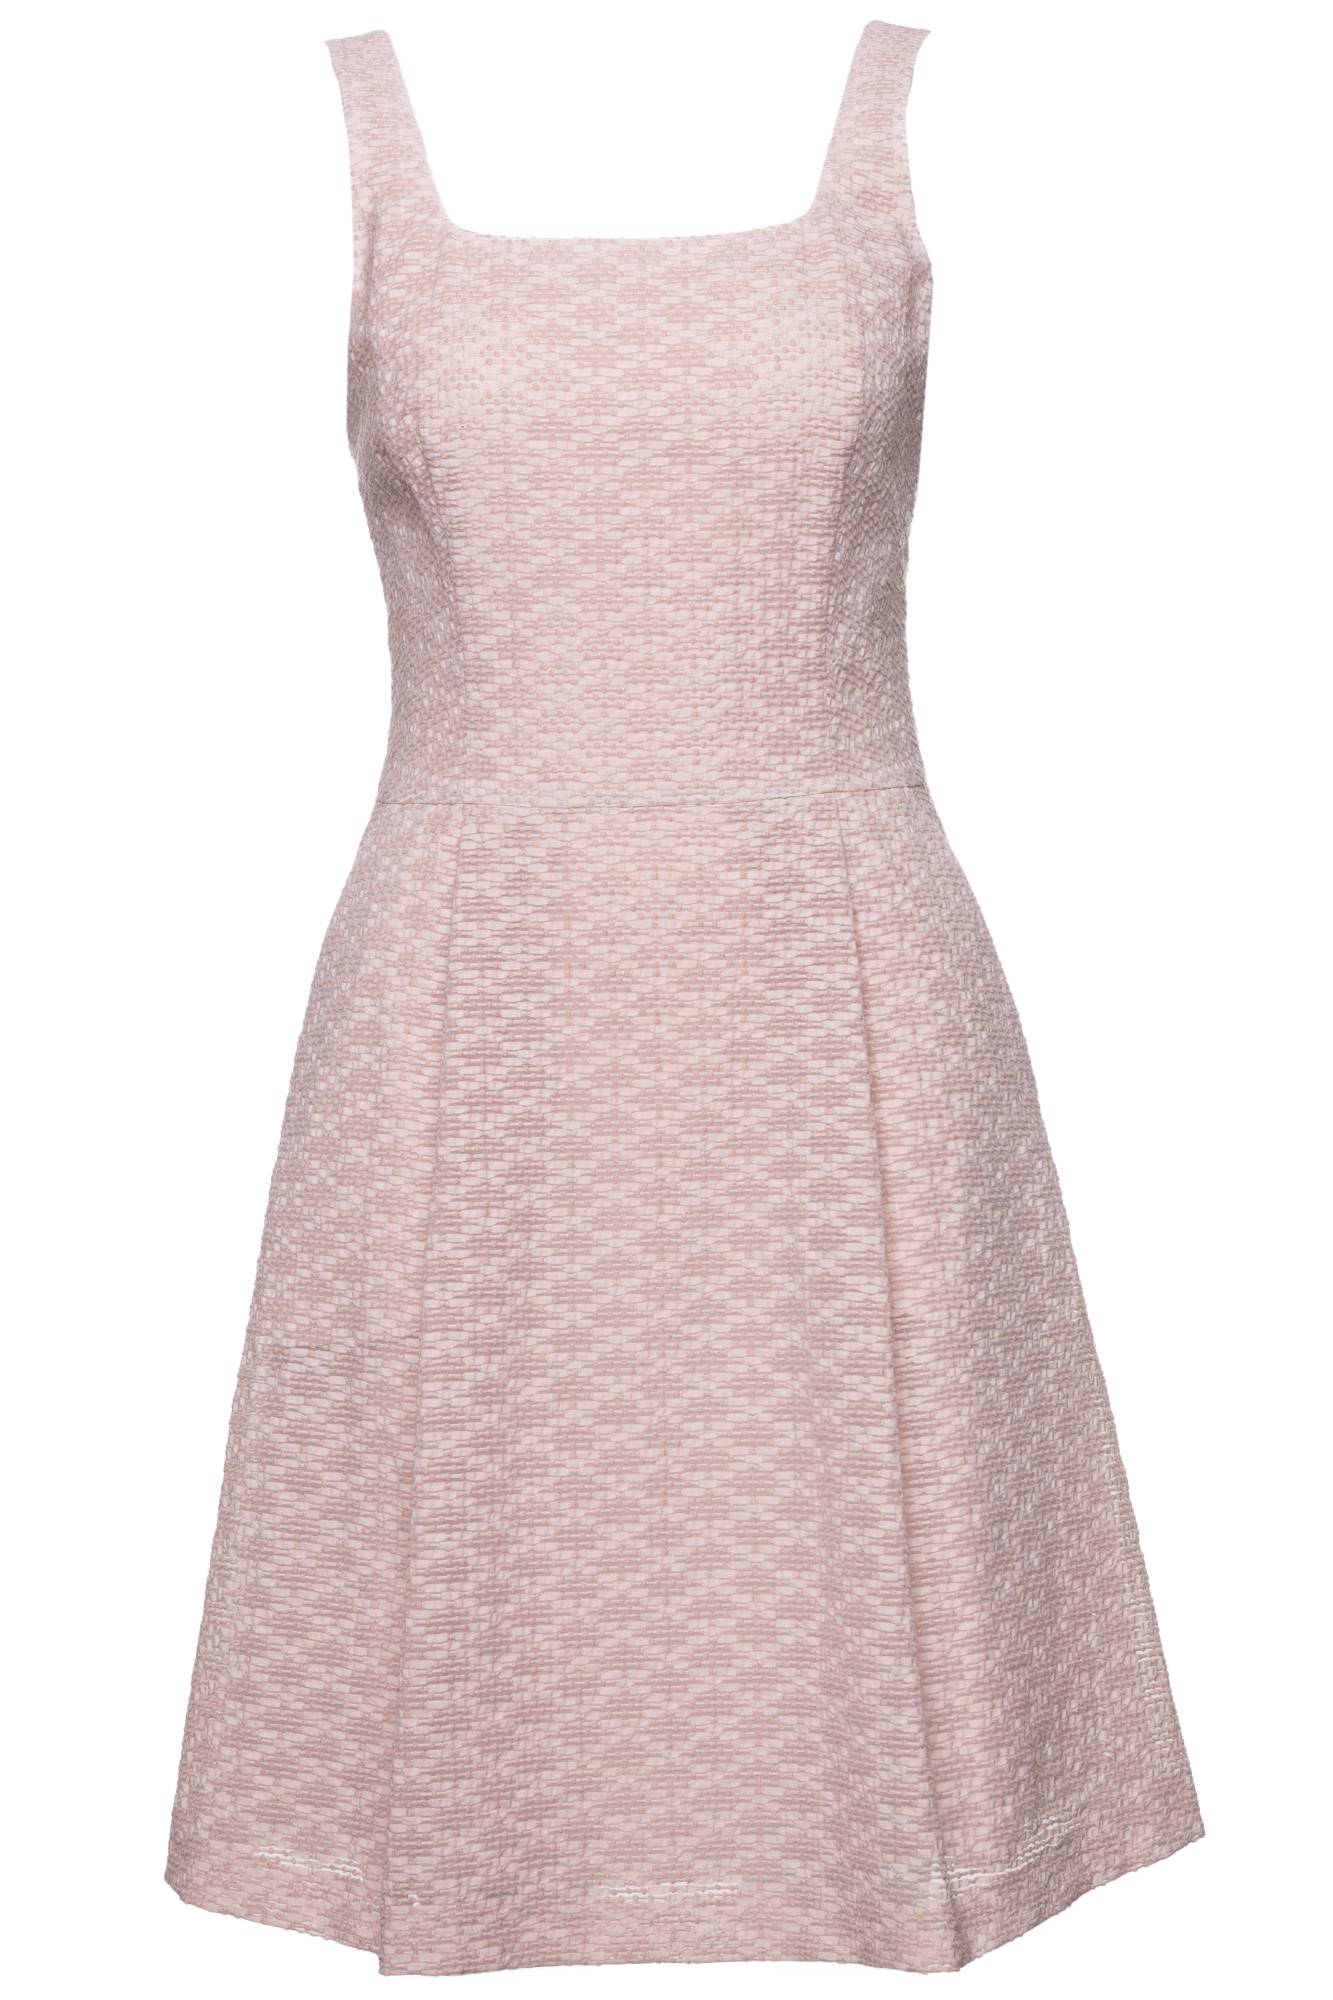 Kleid Hugo KalinkeEgo KalinkeEgo ist Onlineshop Kleid Hugo 534ARLqScj